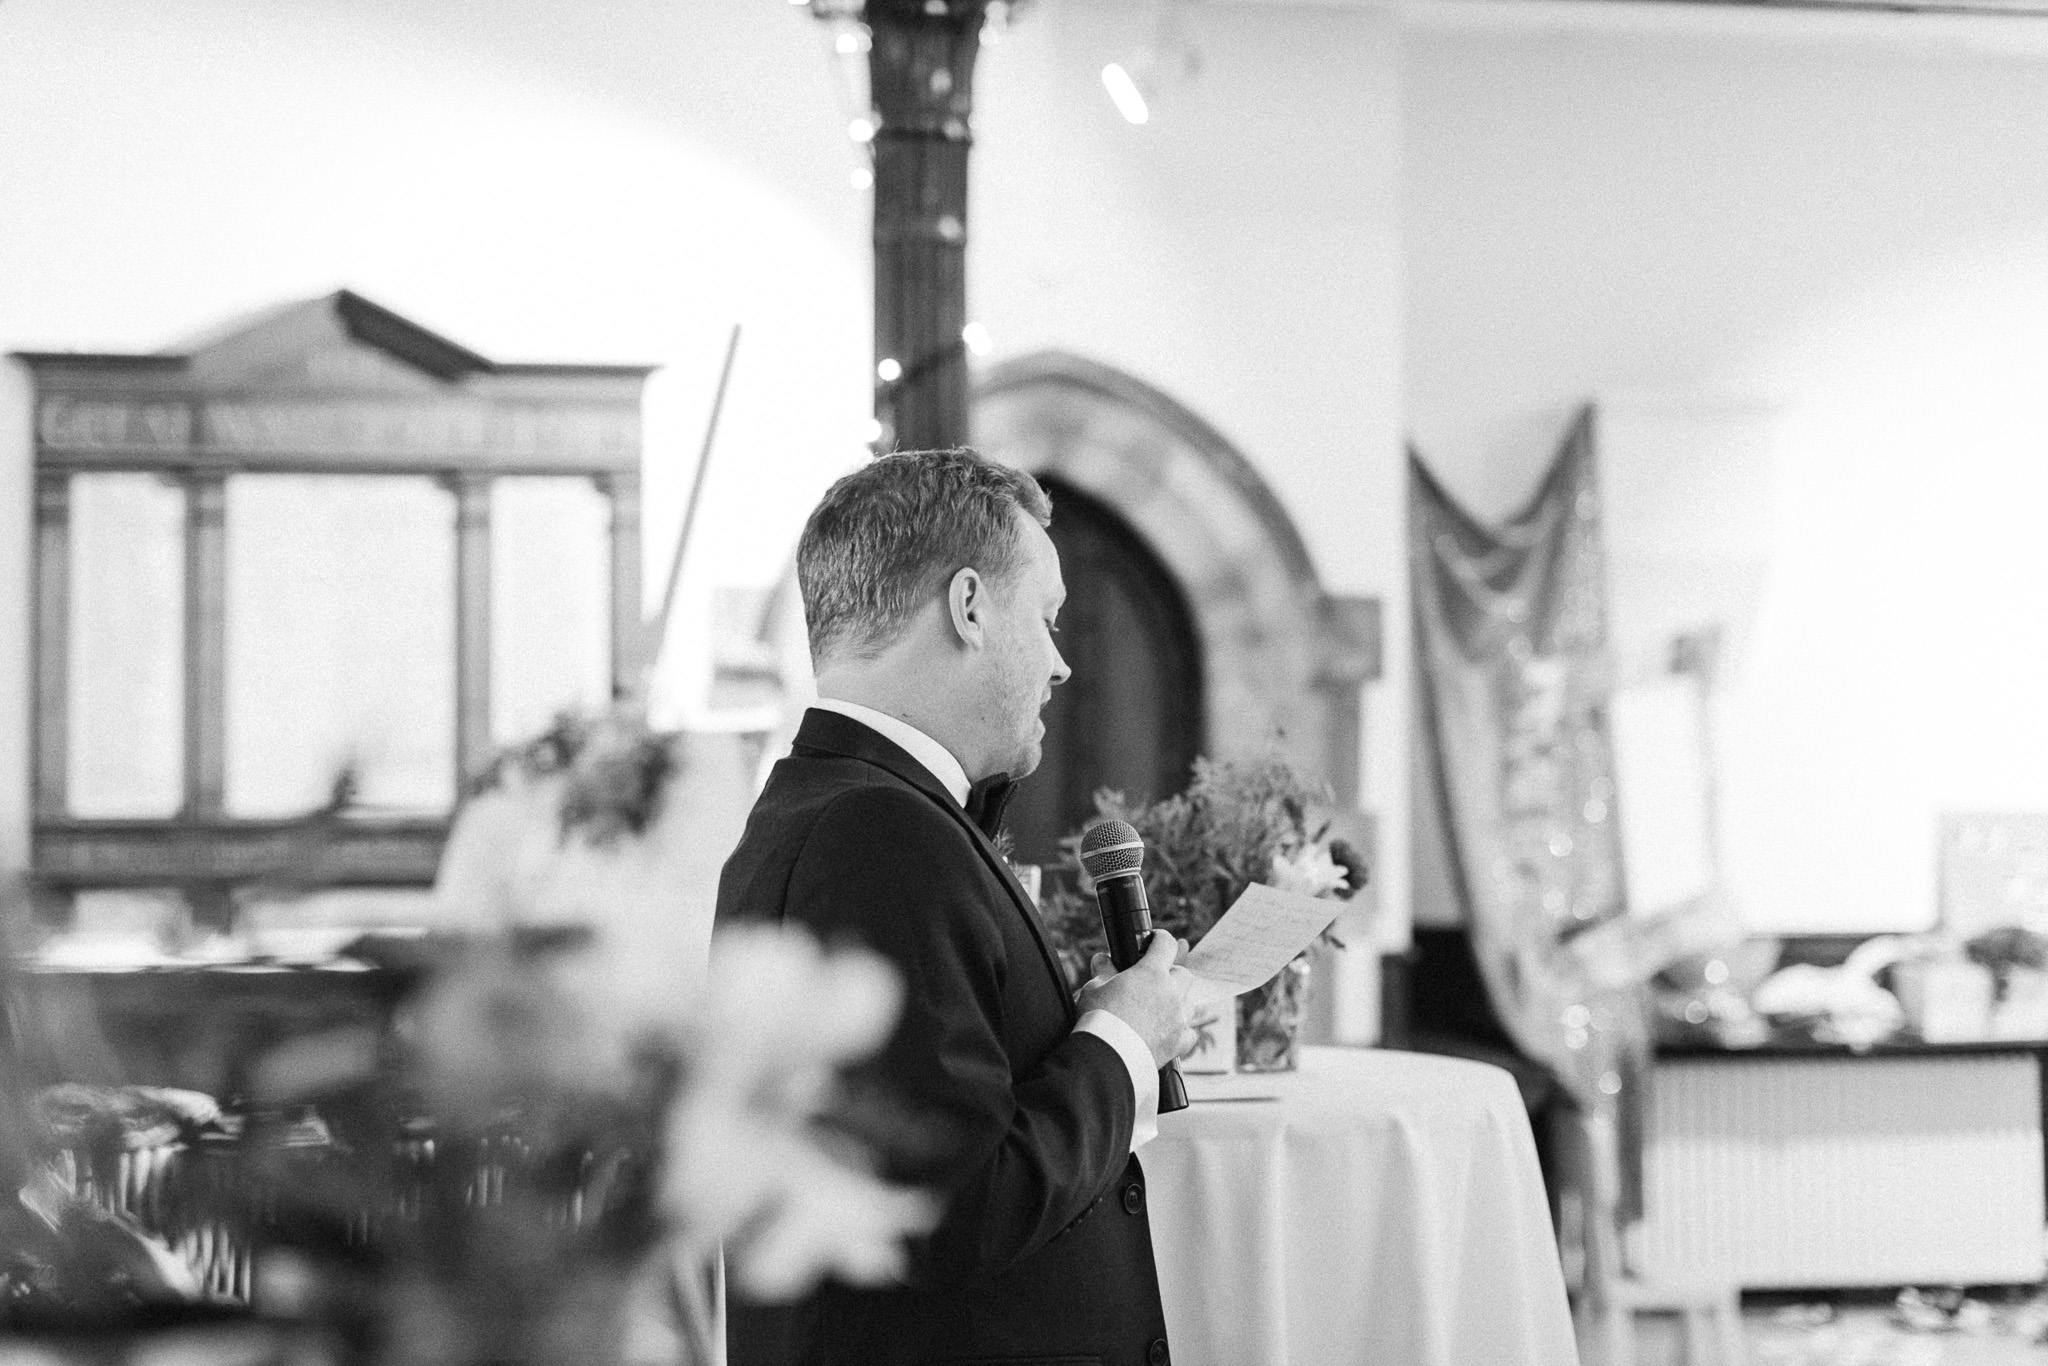 st_andrews_fabrica_brighton_wedding_617.jpg